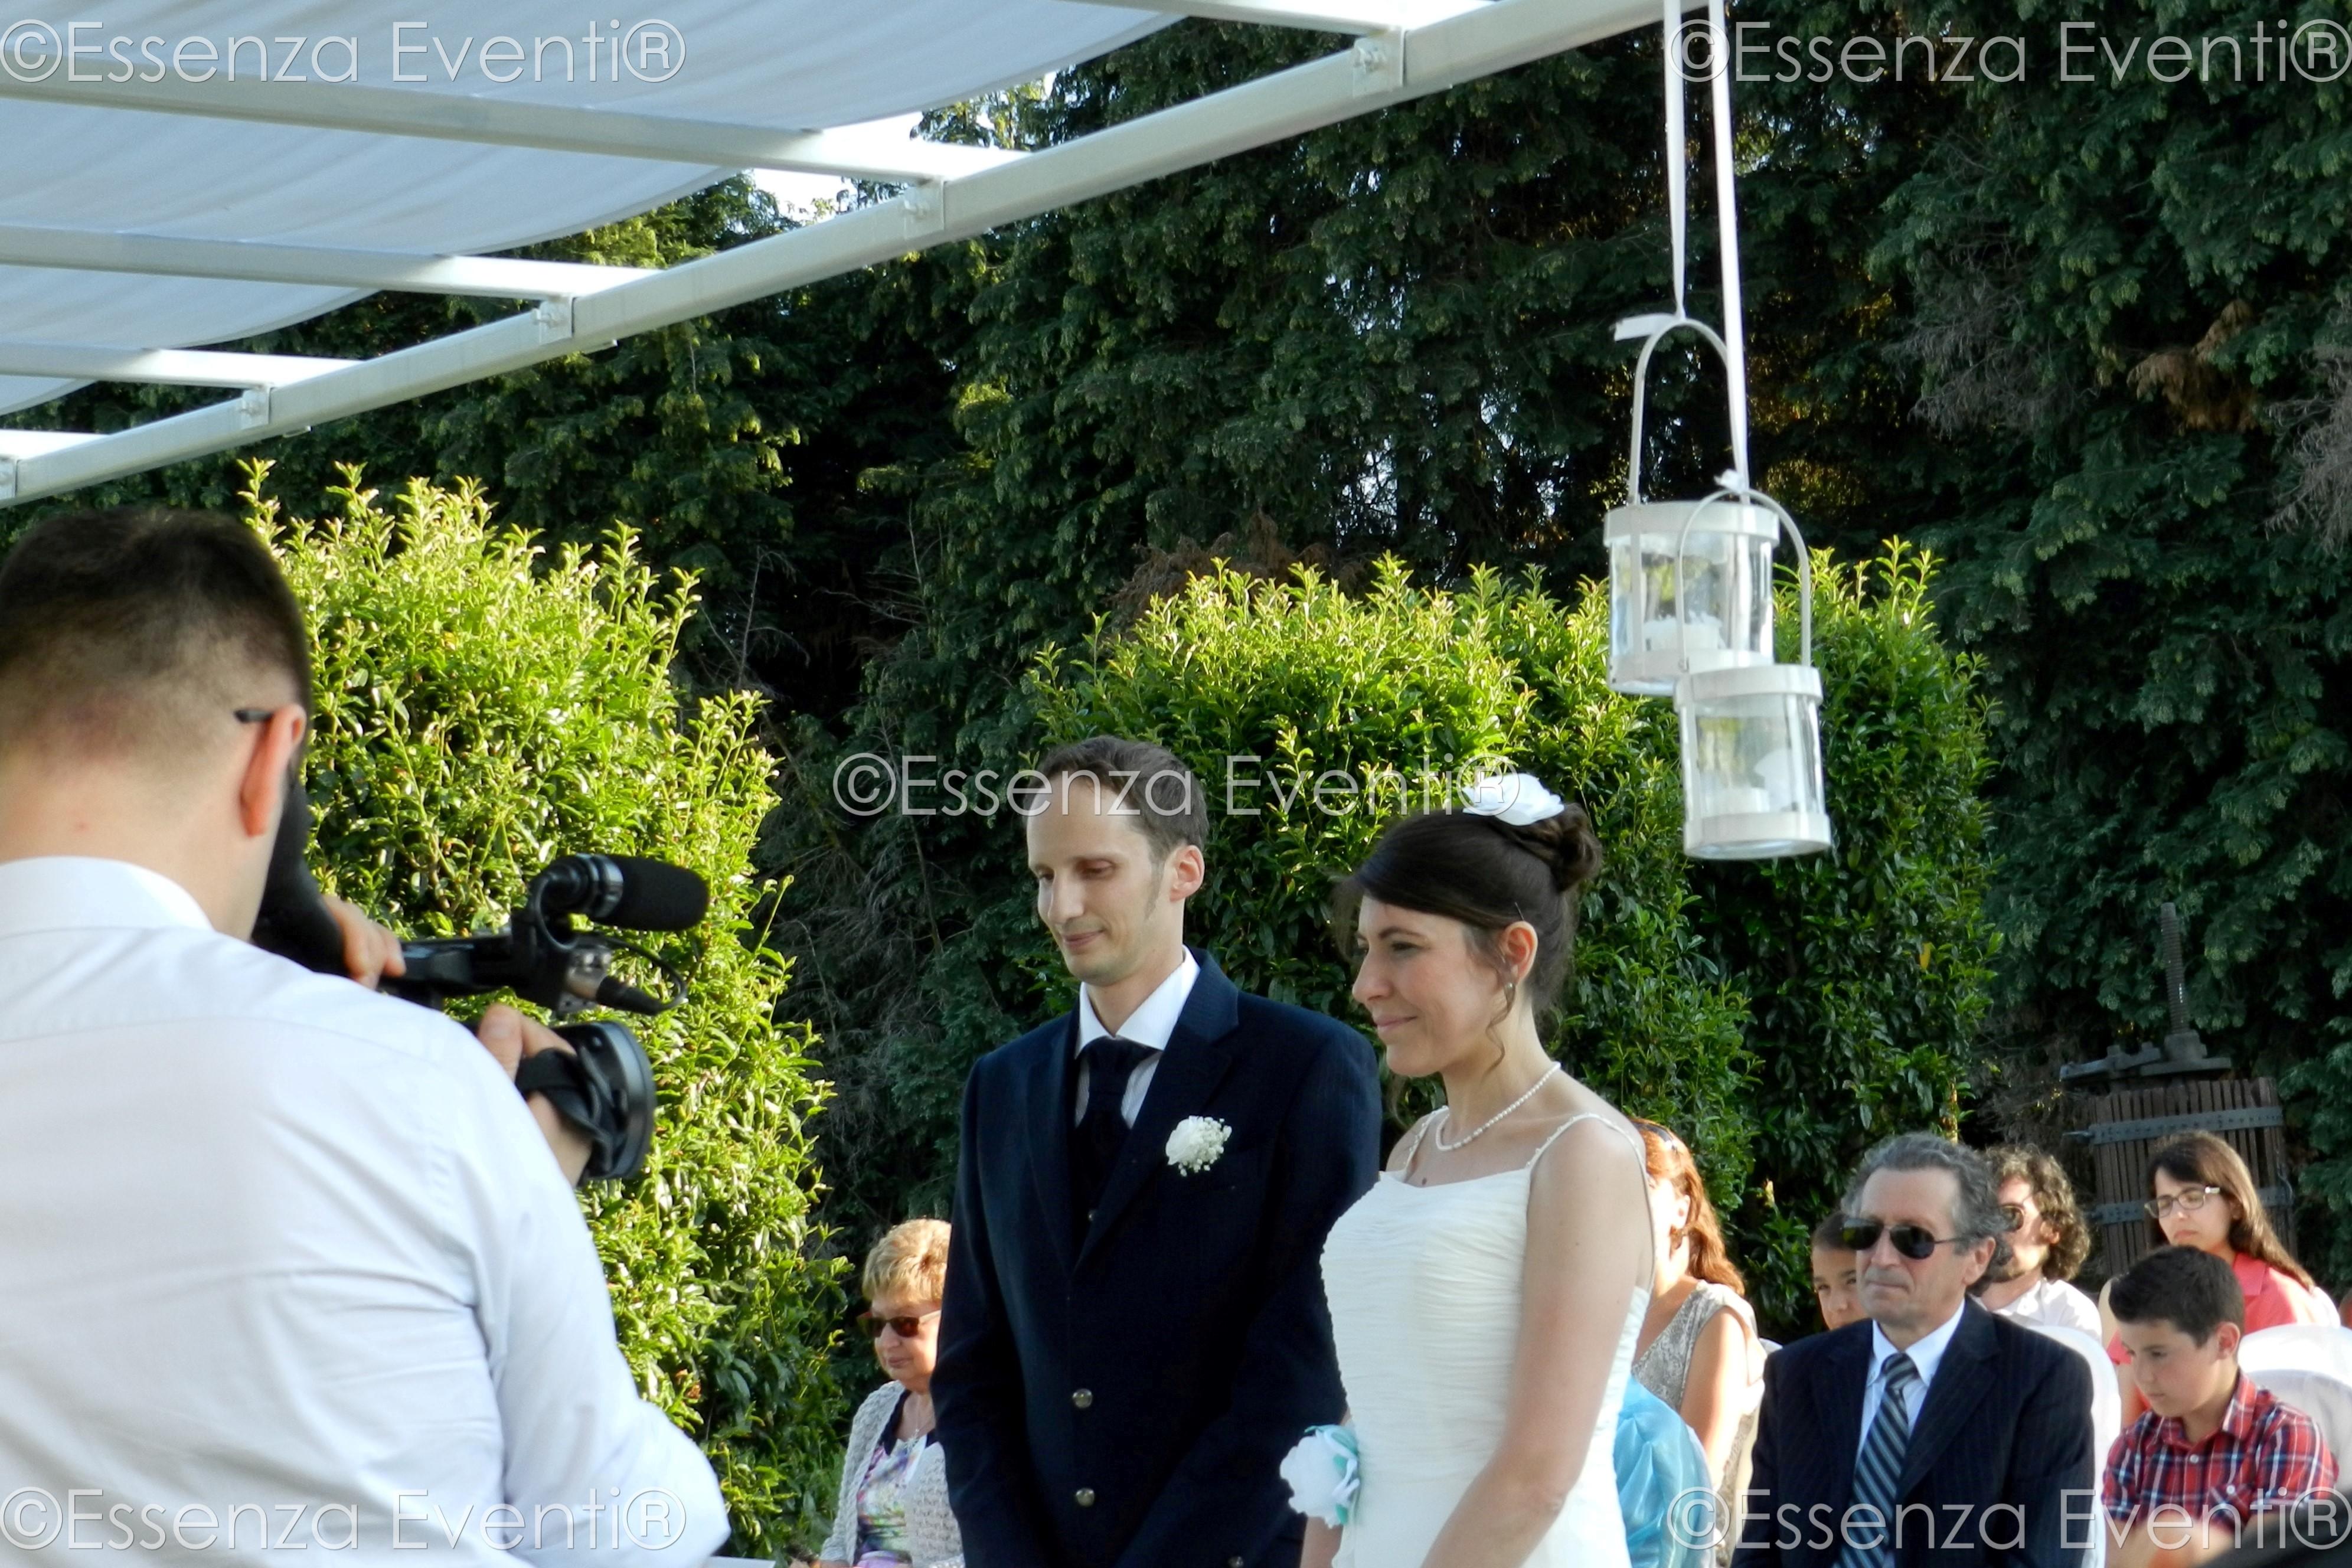 Matrimonio Simbolico Celebrante : Nicola serena ° anniversario matrimonio celebrante